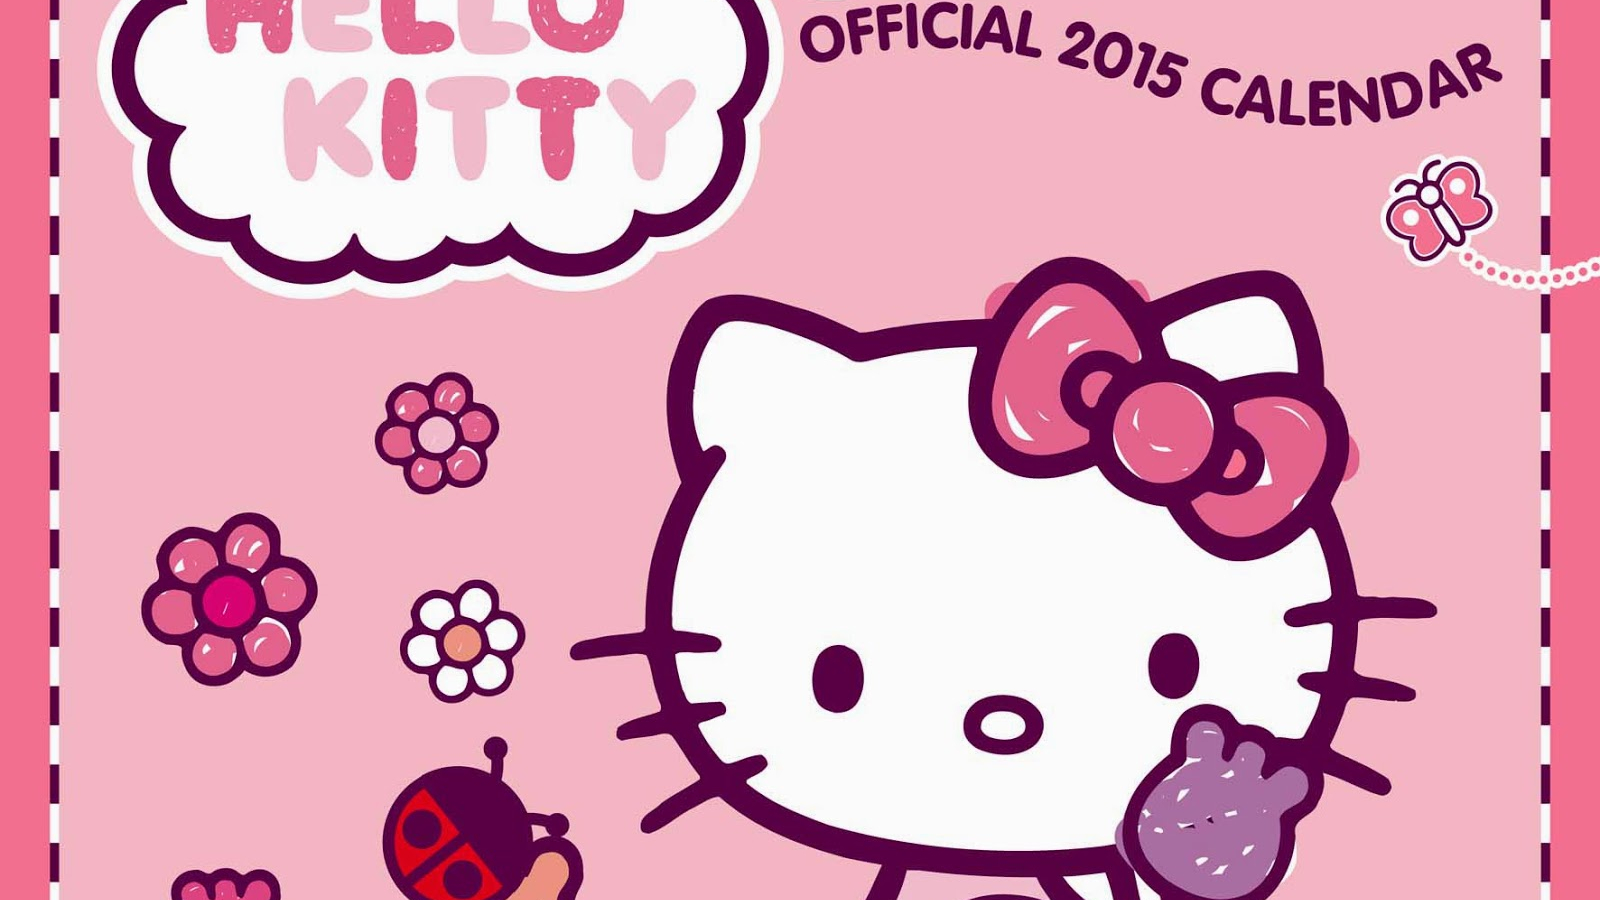 Free Gambar Hello Kitty Kalender Gambar Animasi